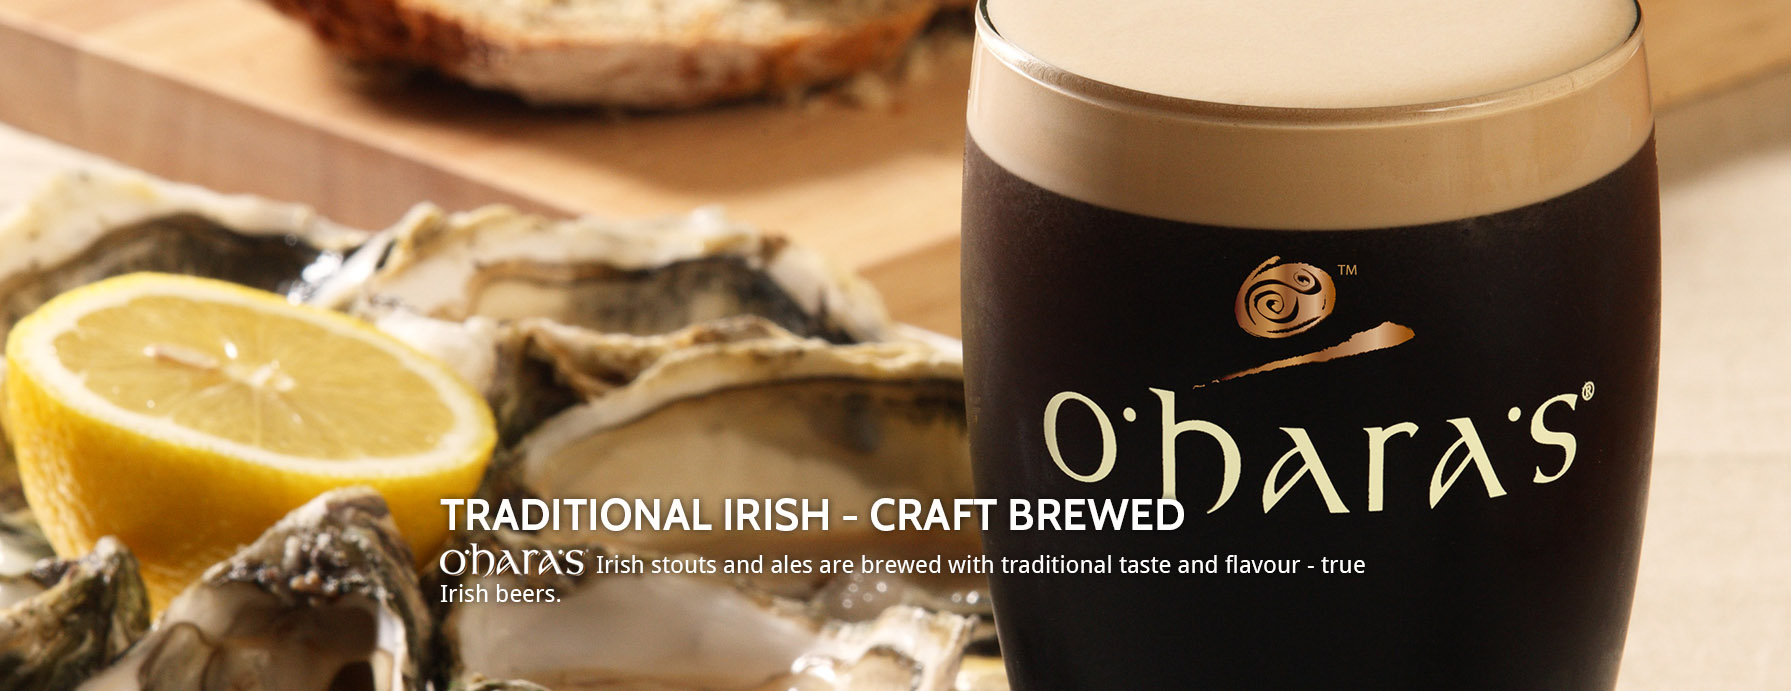 Home-Page-Traditional-Irish-Craft-Brew-34